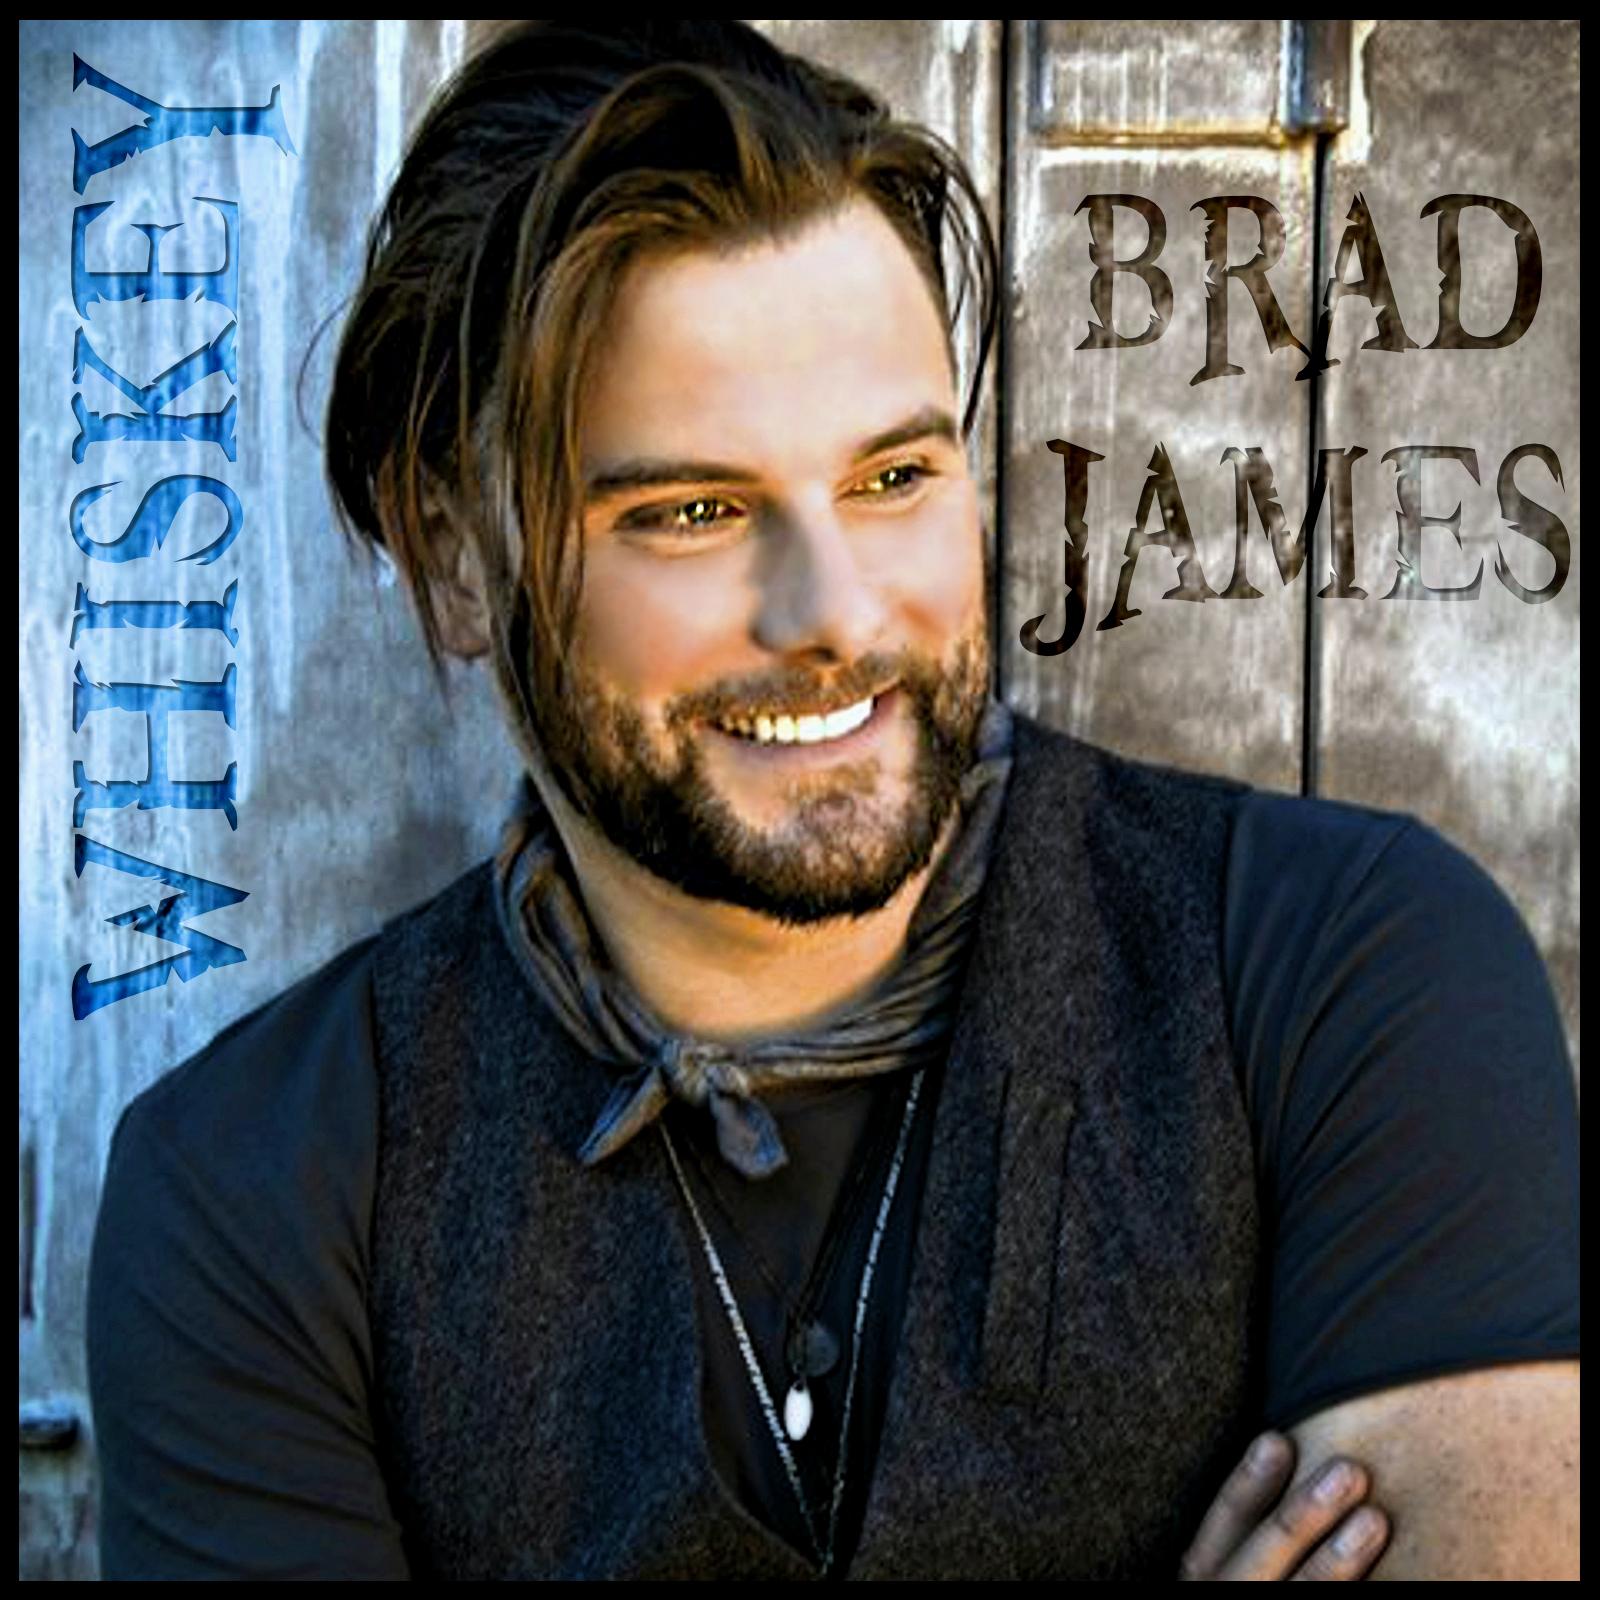 Brad Test 2.jpg